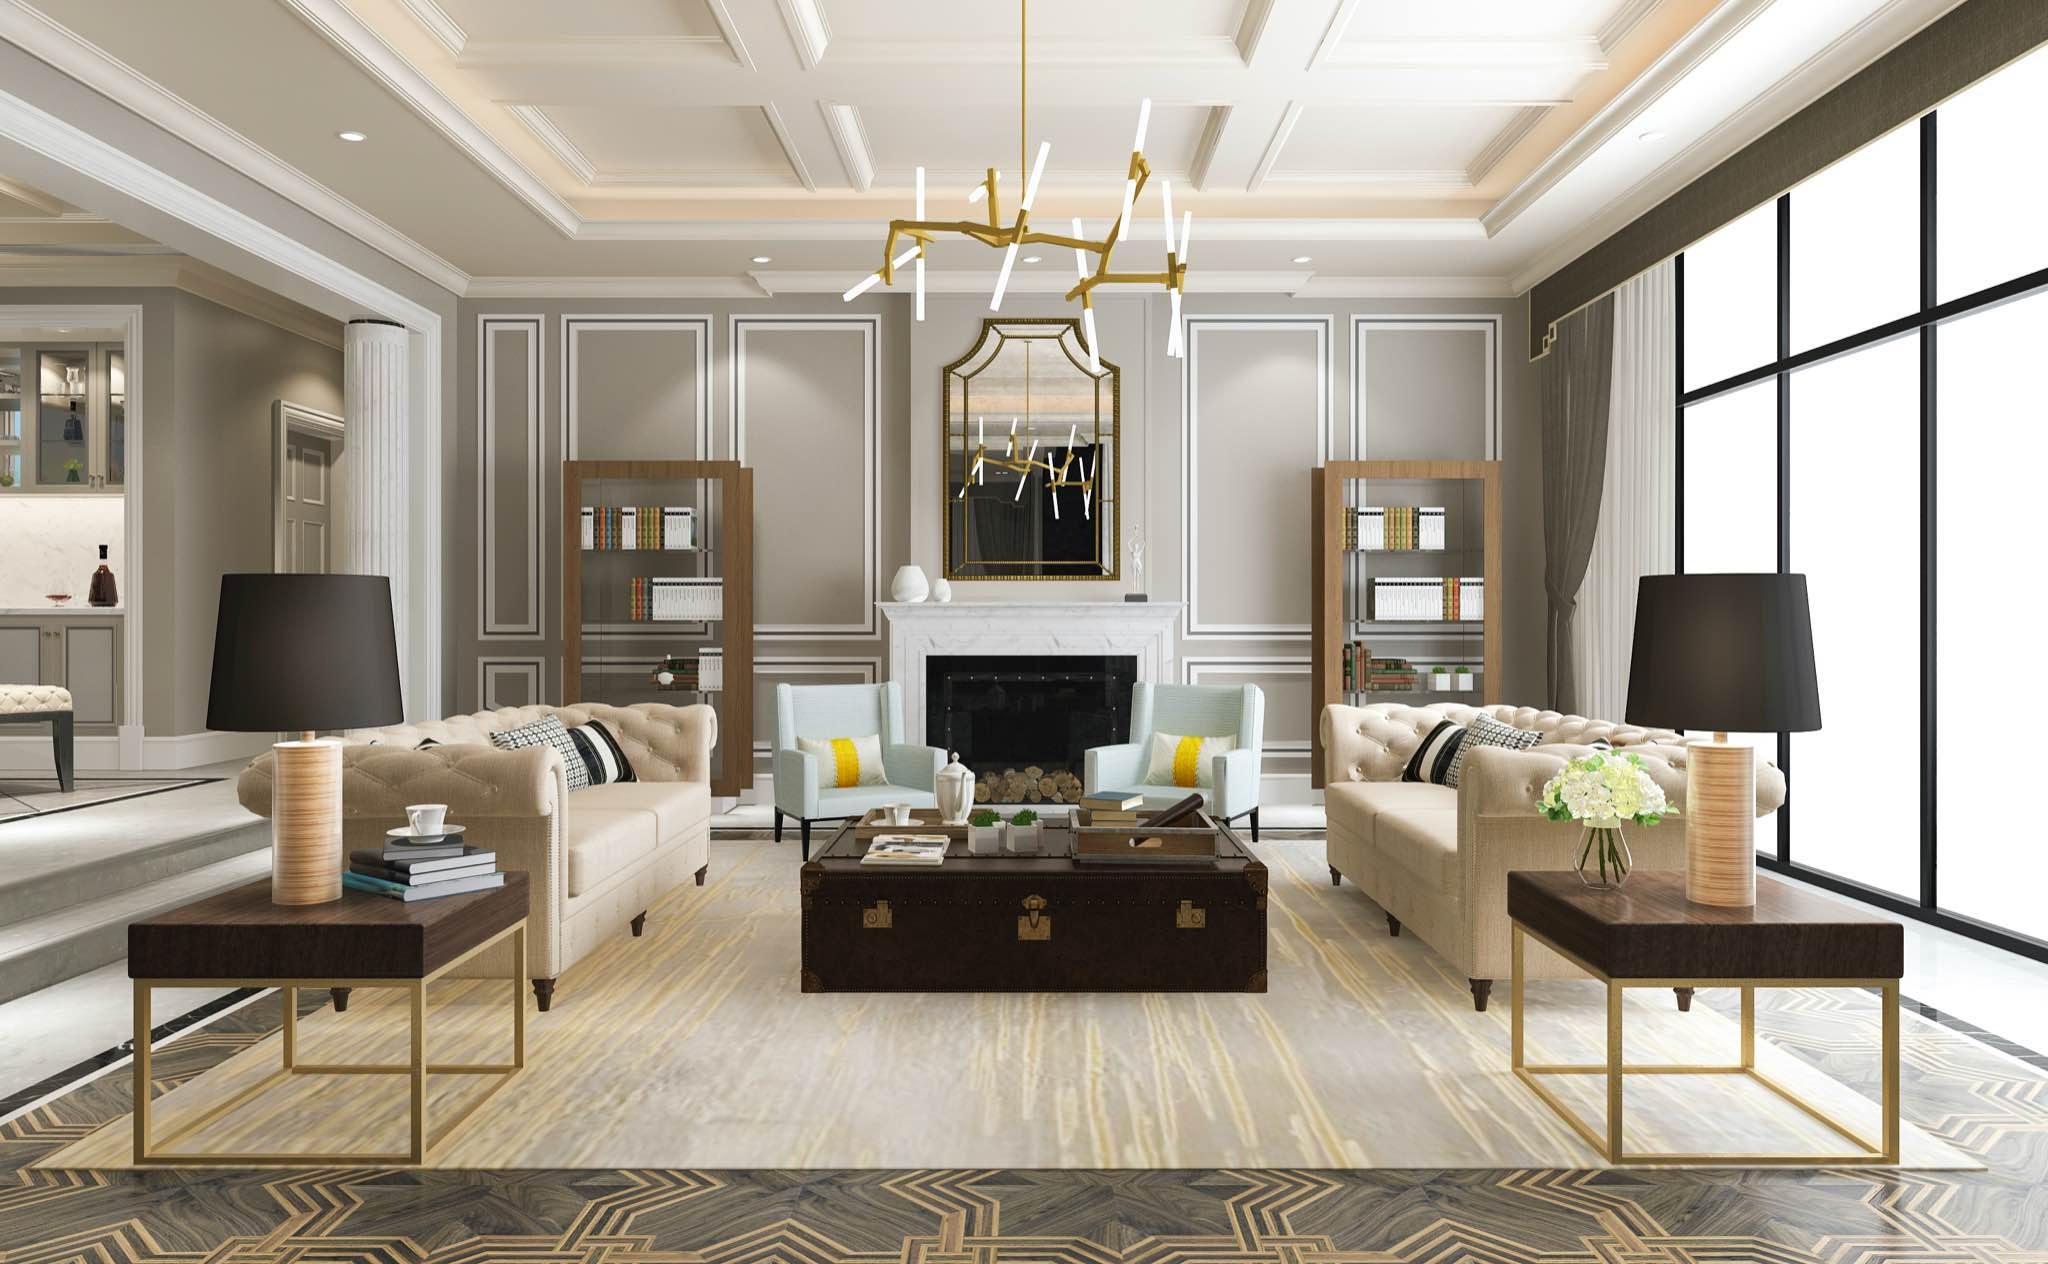 Lissa Cline Header Image of Living Room